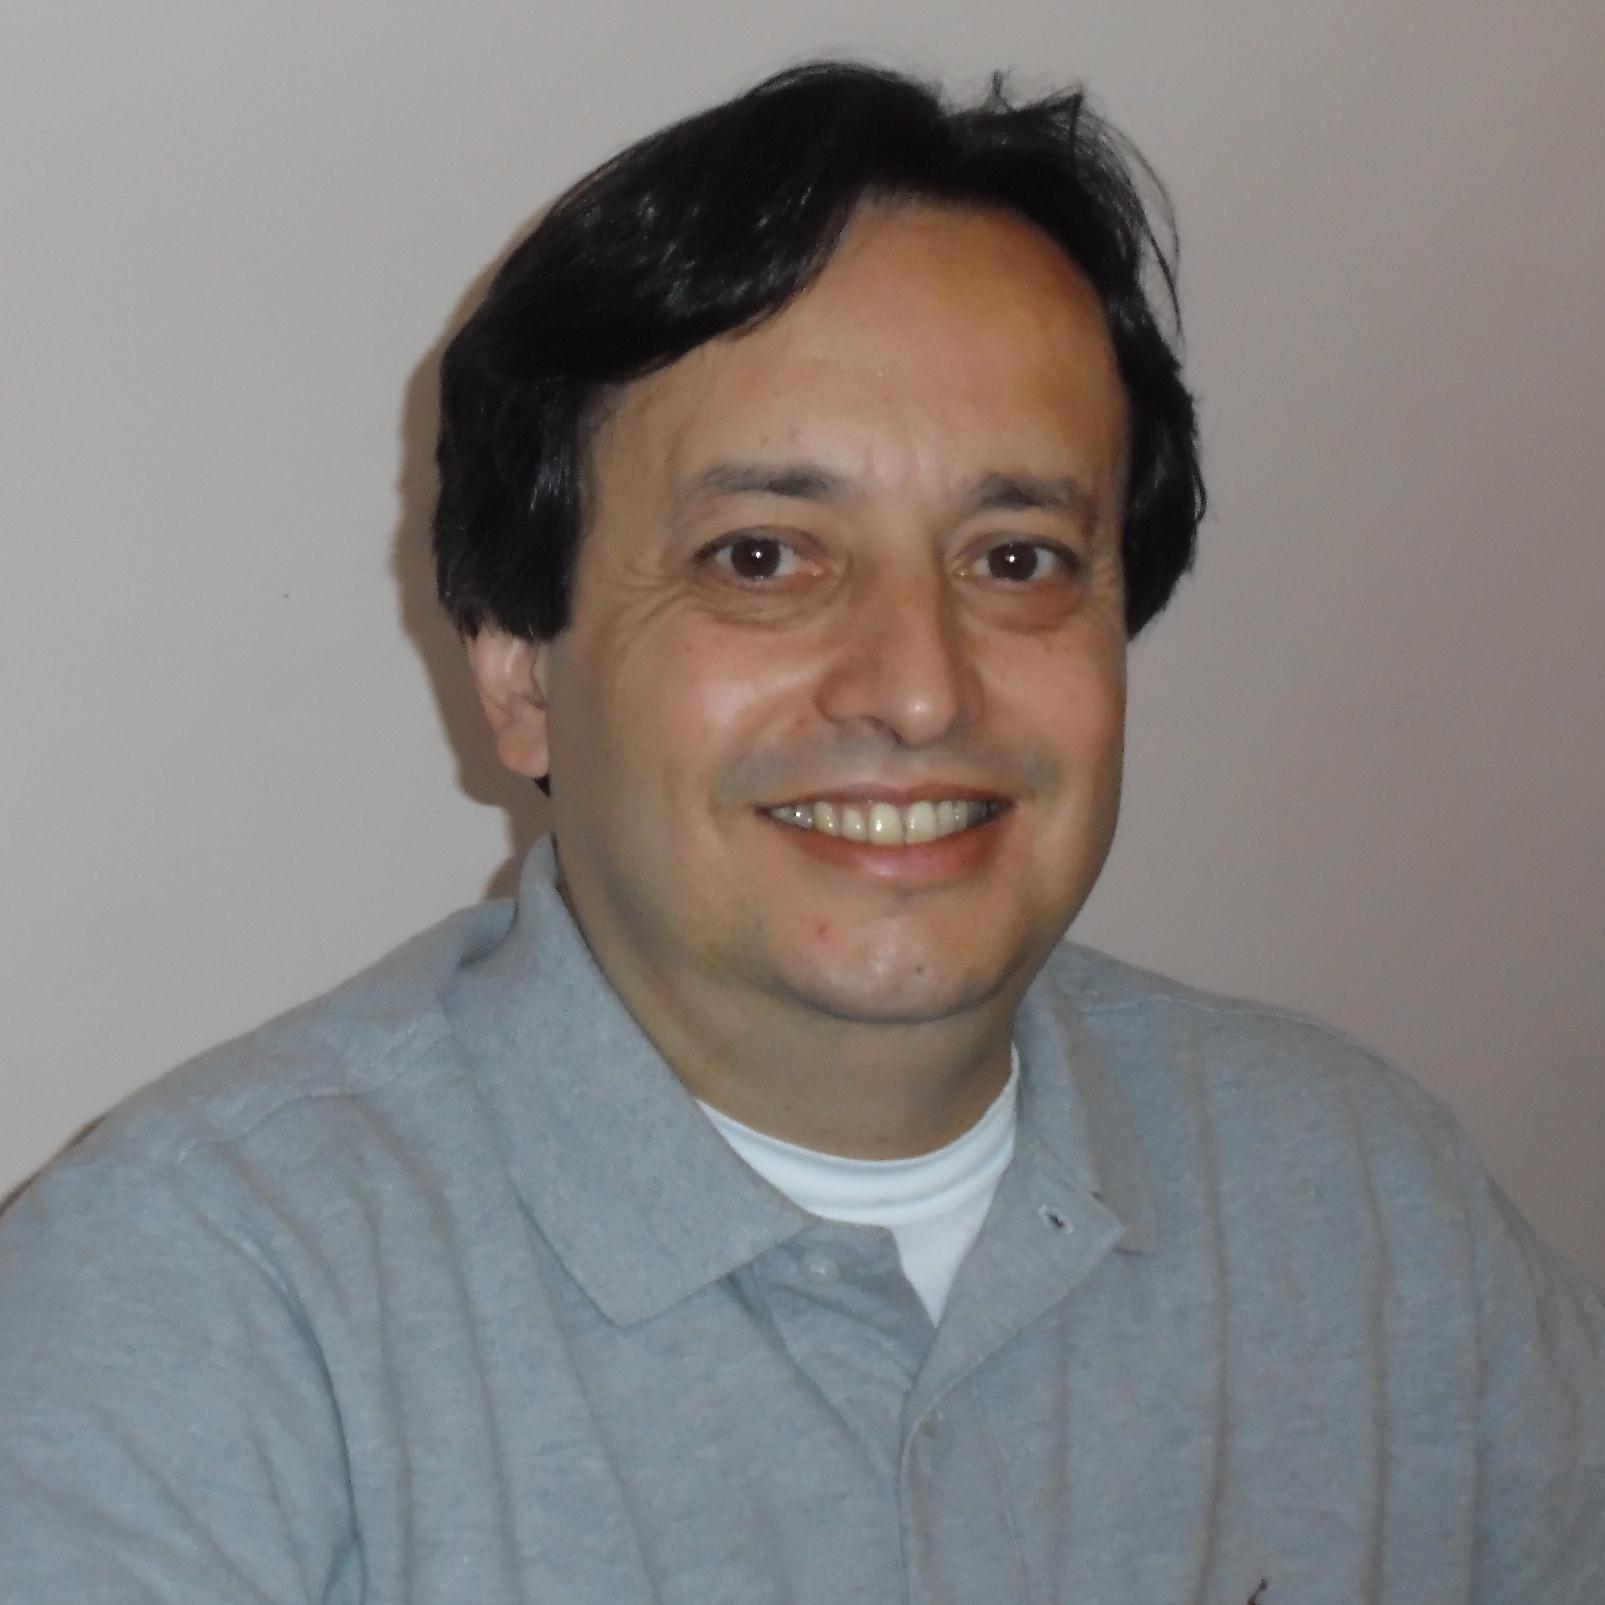 Gustavo-Vasconcellos.JPG